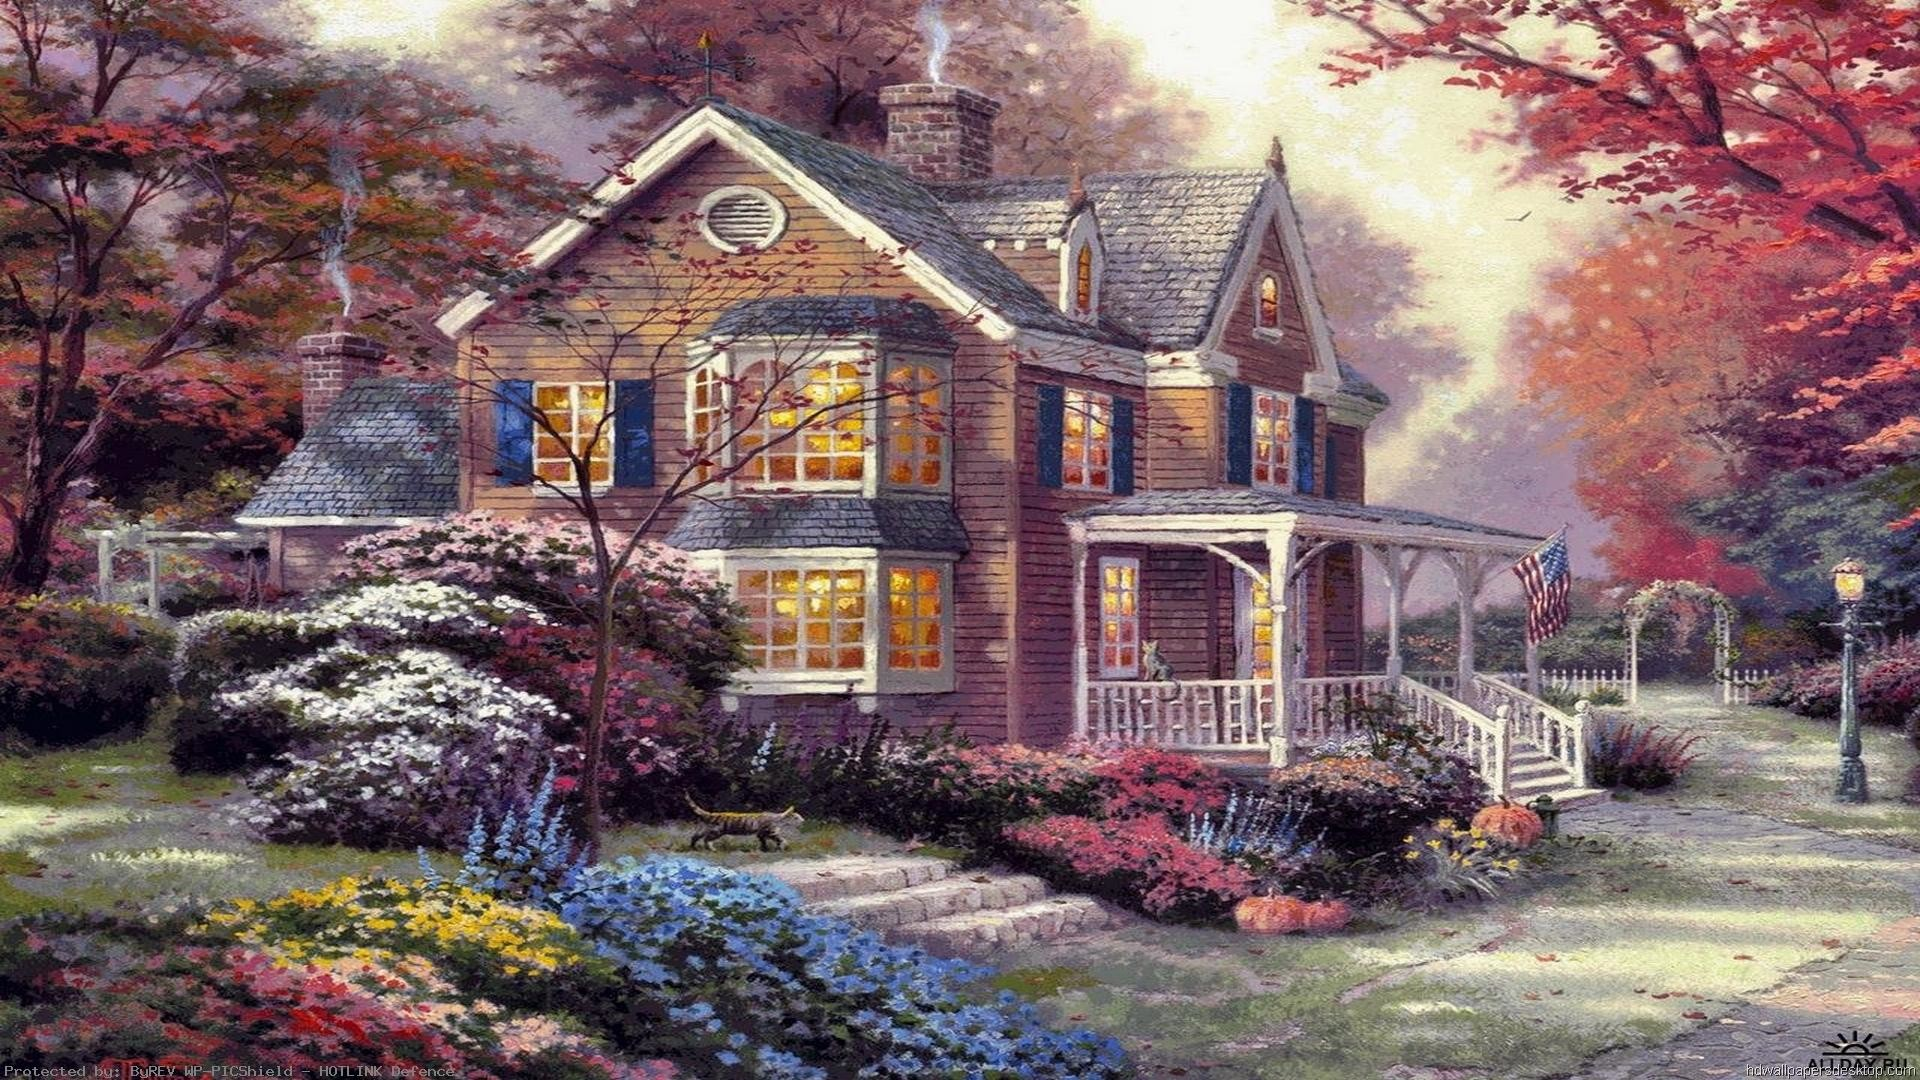 Image-Detail-for-Thomas-Kinkade-Paintings-Art-HD-